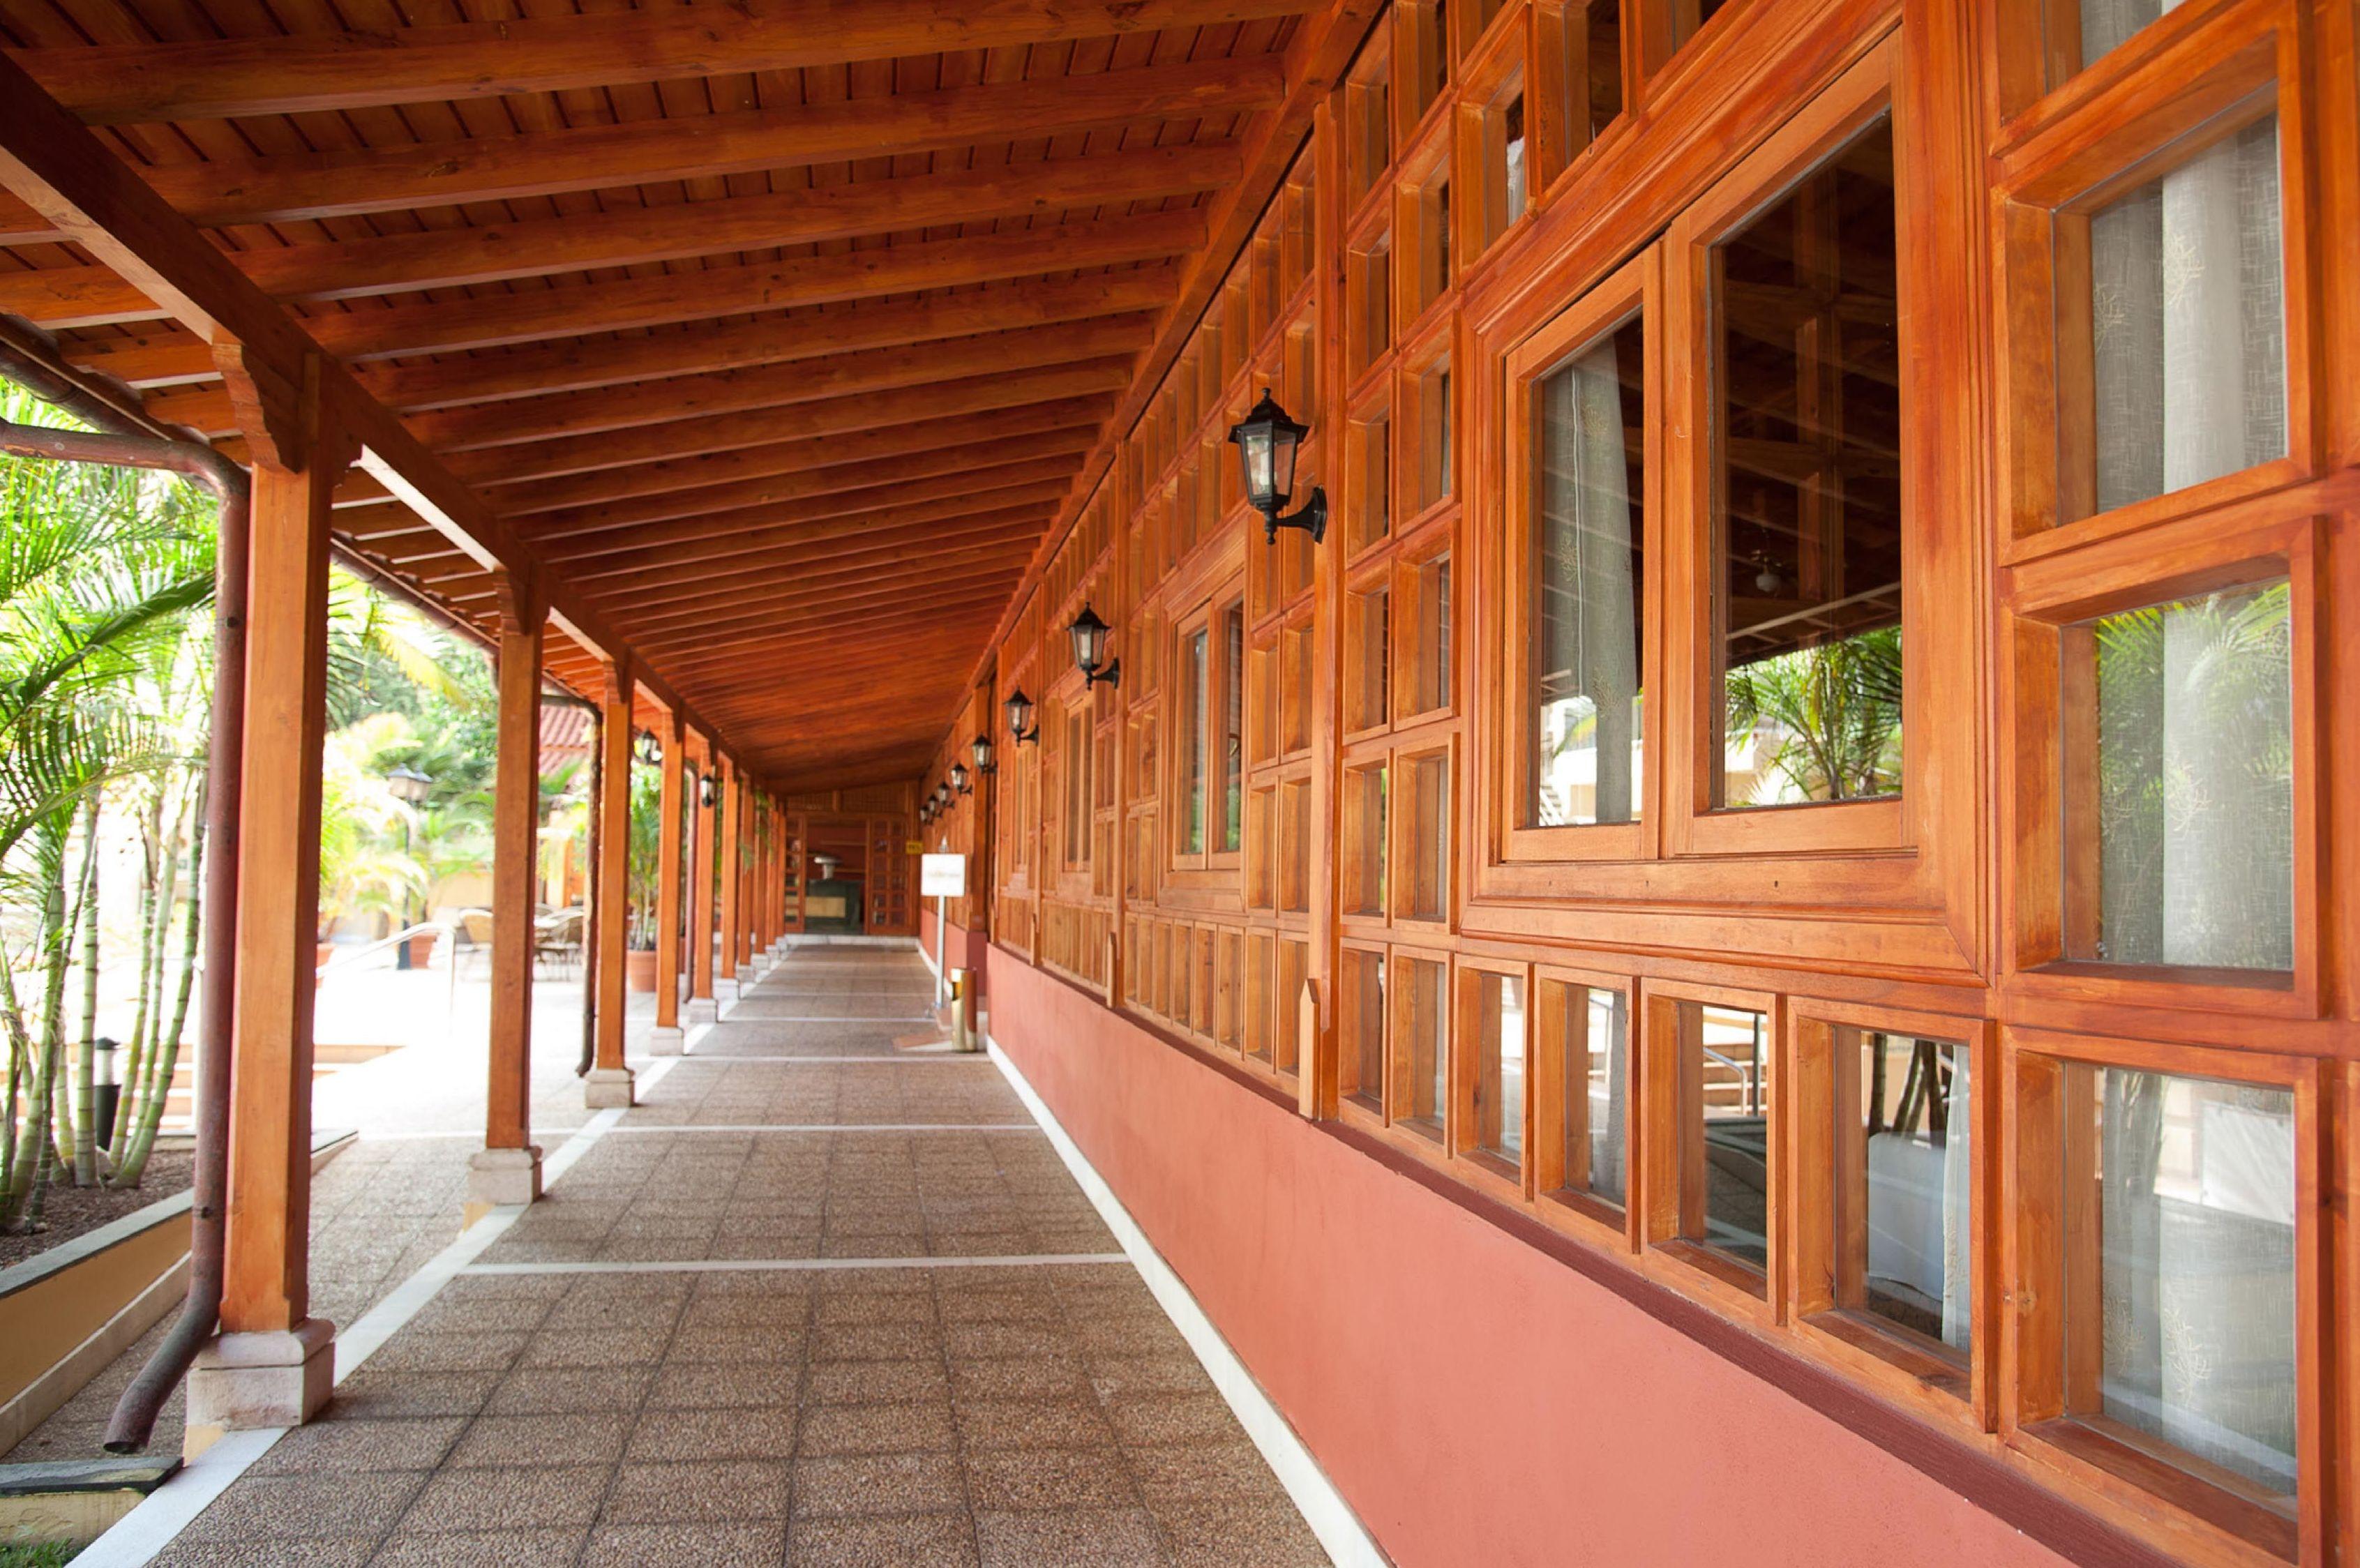 Techo Madera Wood Veranda Porch Tenerife